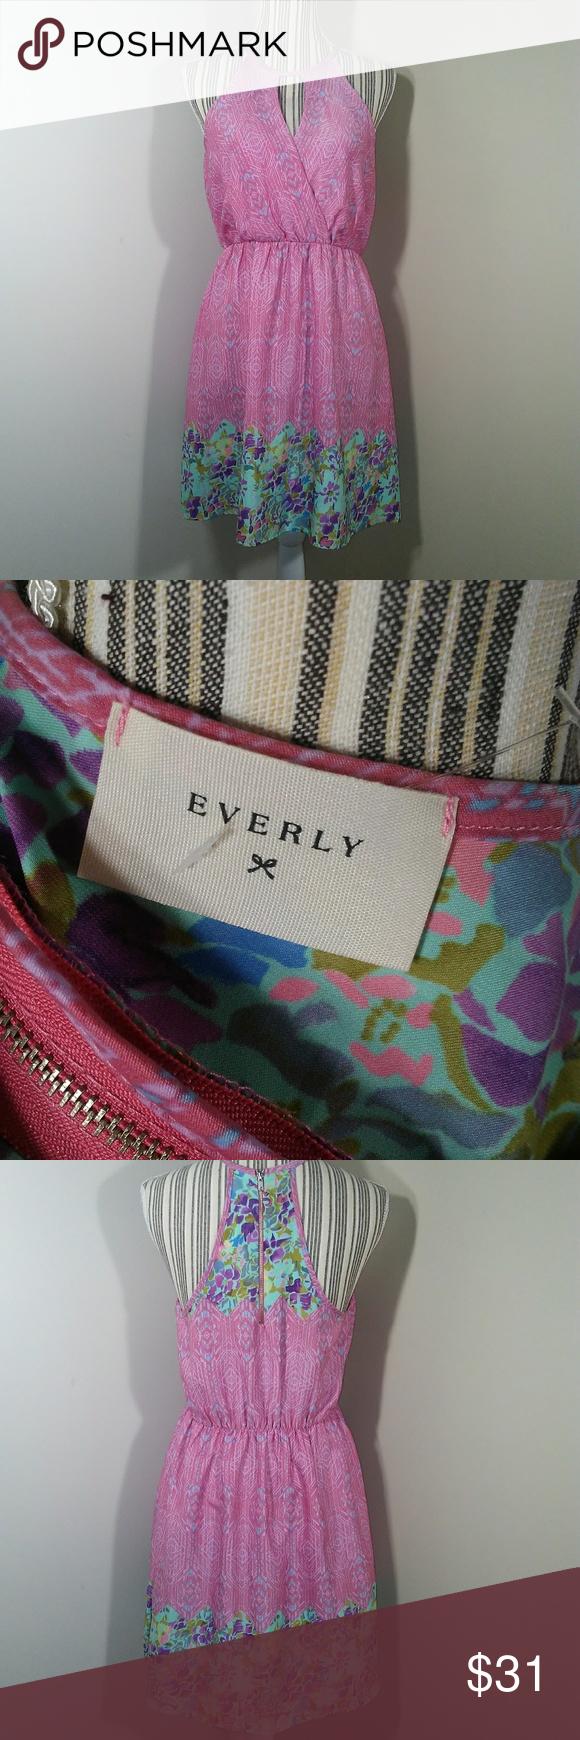 Everly dress pink keyhole neck exposed zipper sz m my posh picks